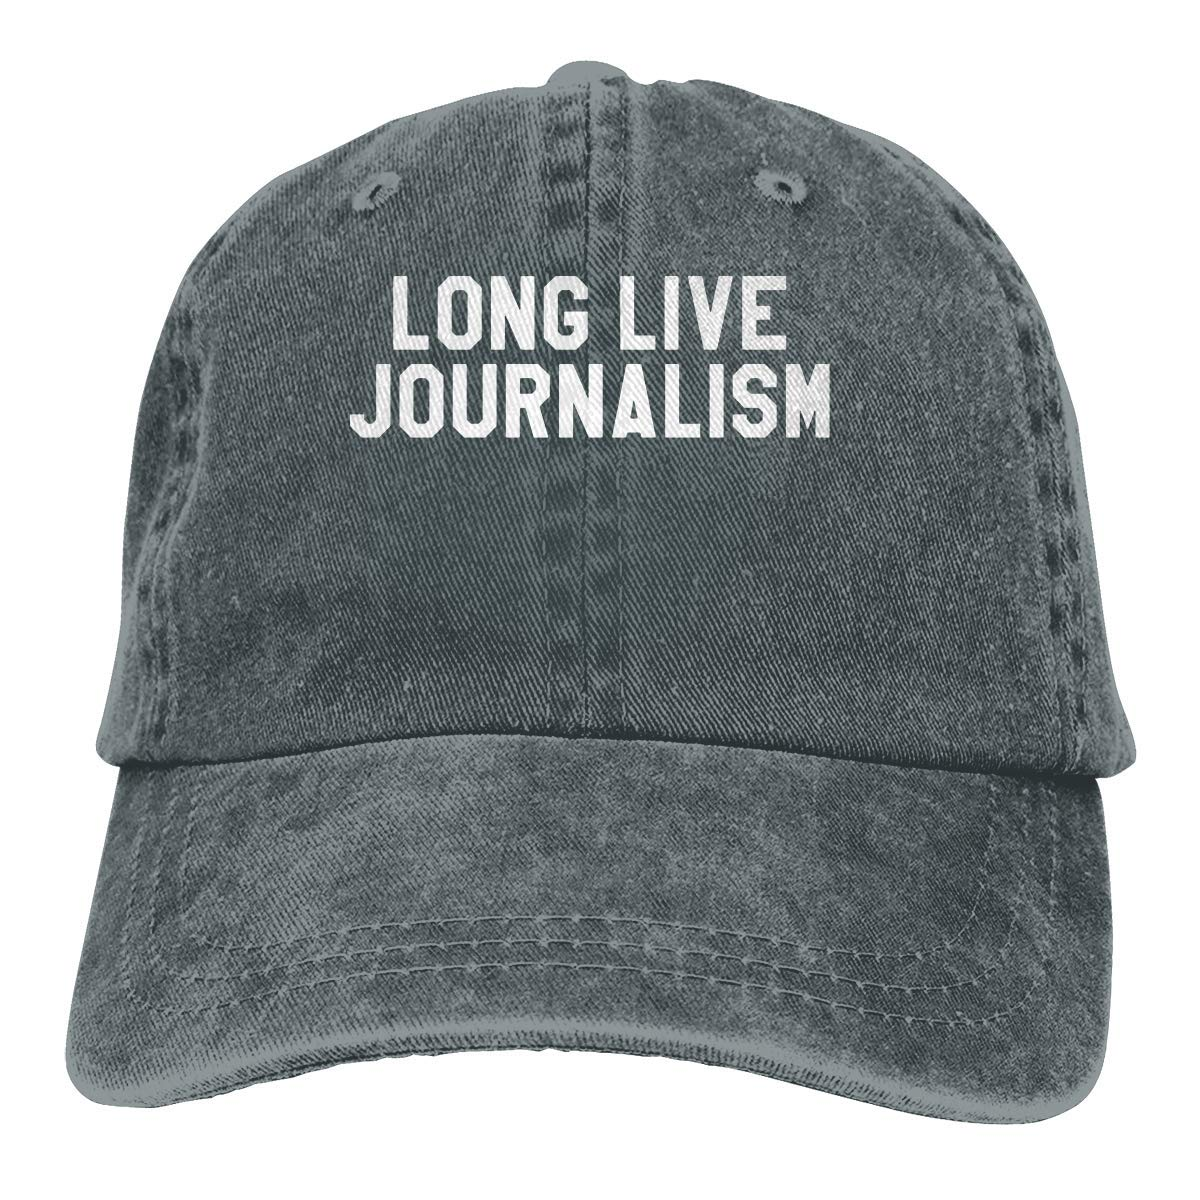 EHECD Long Live Journalism Denim Hats Washed Retro Baseball Cap Dad Hat